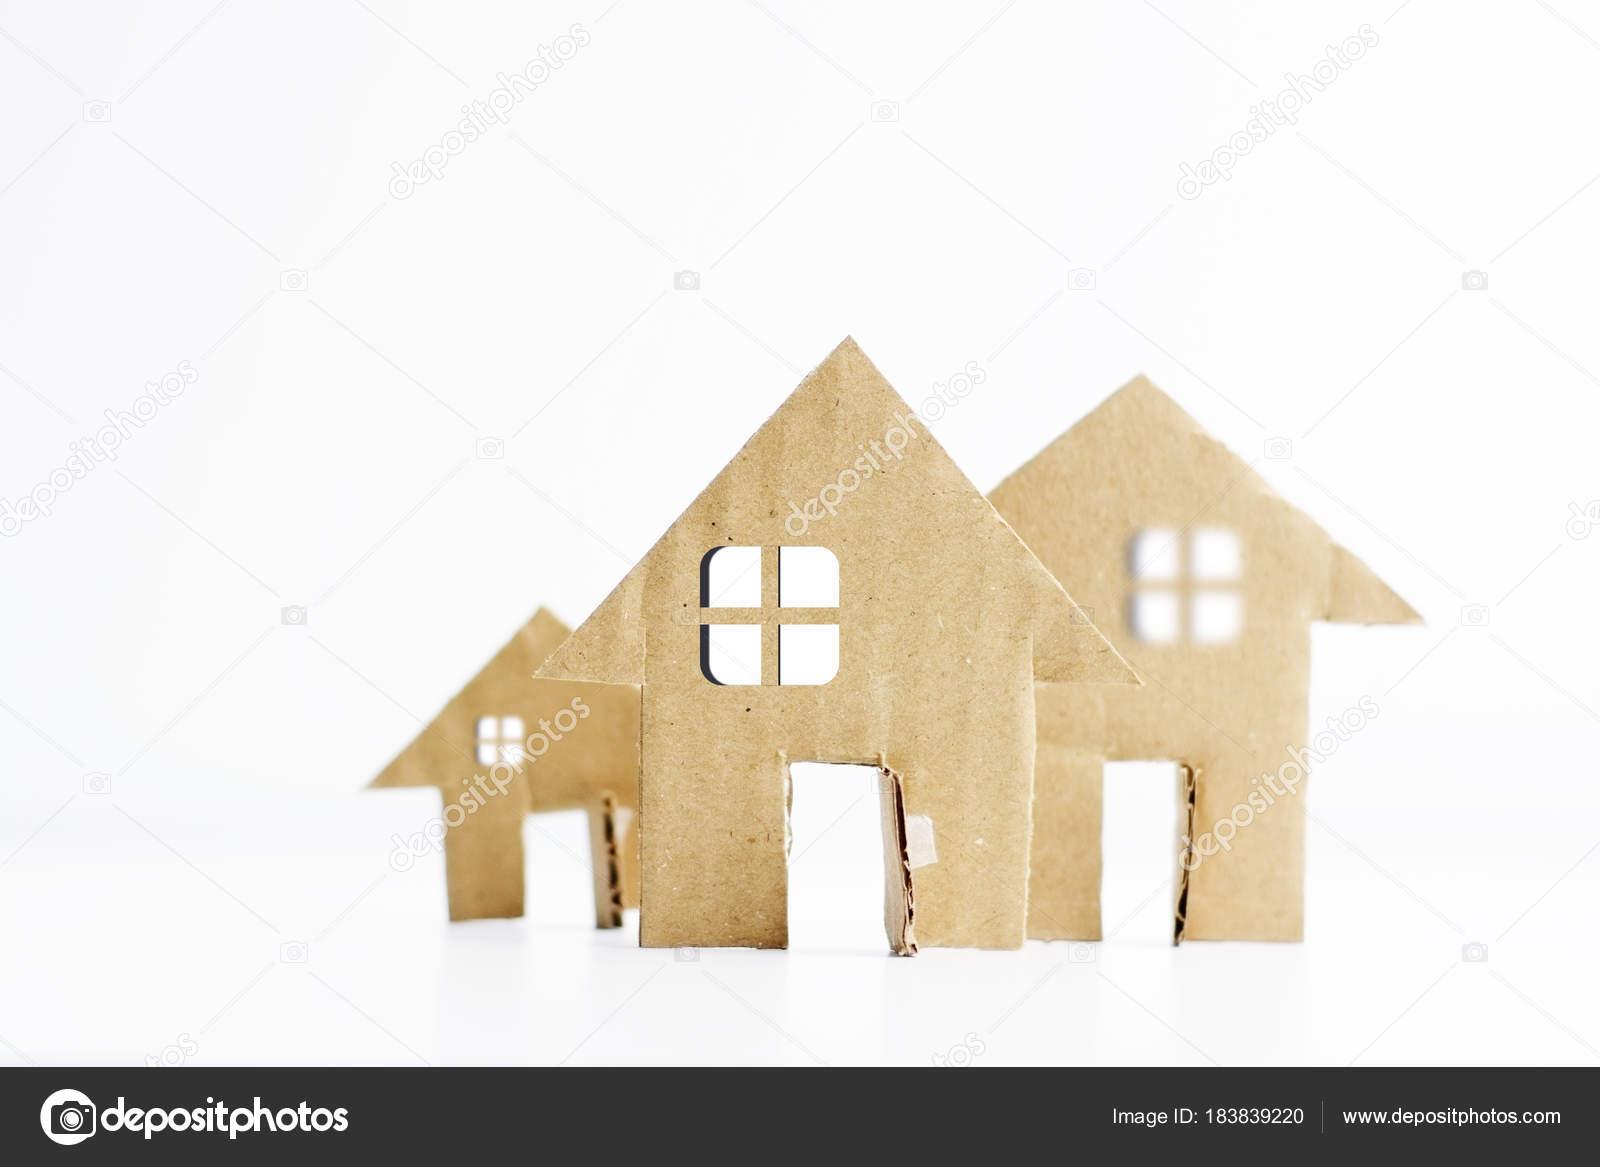 Small Cardboard House Model Small Models Cardboard Houses